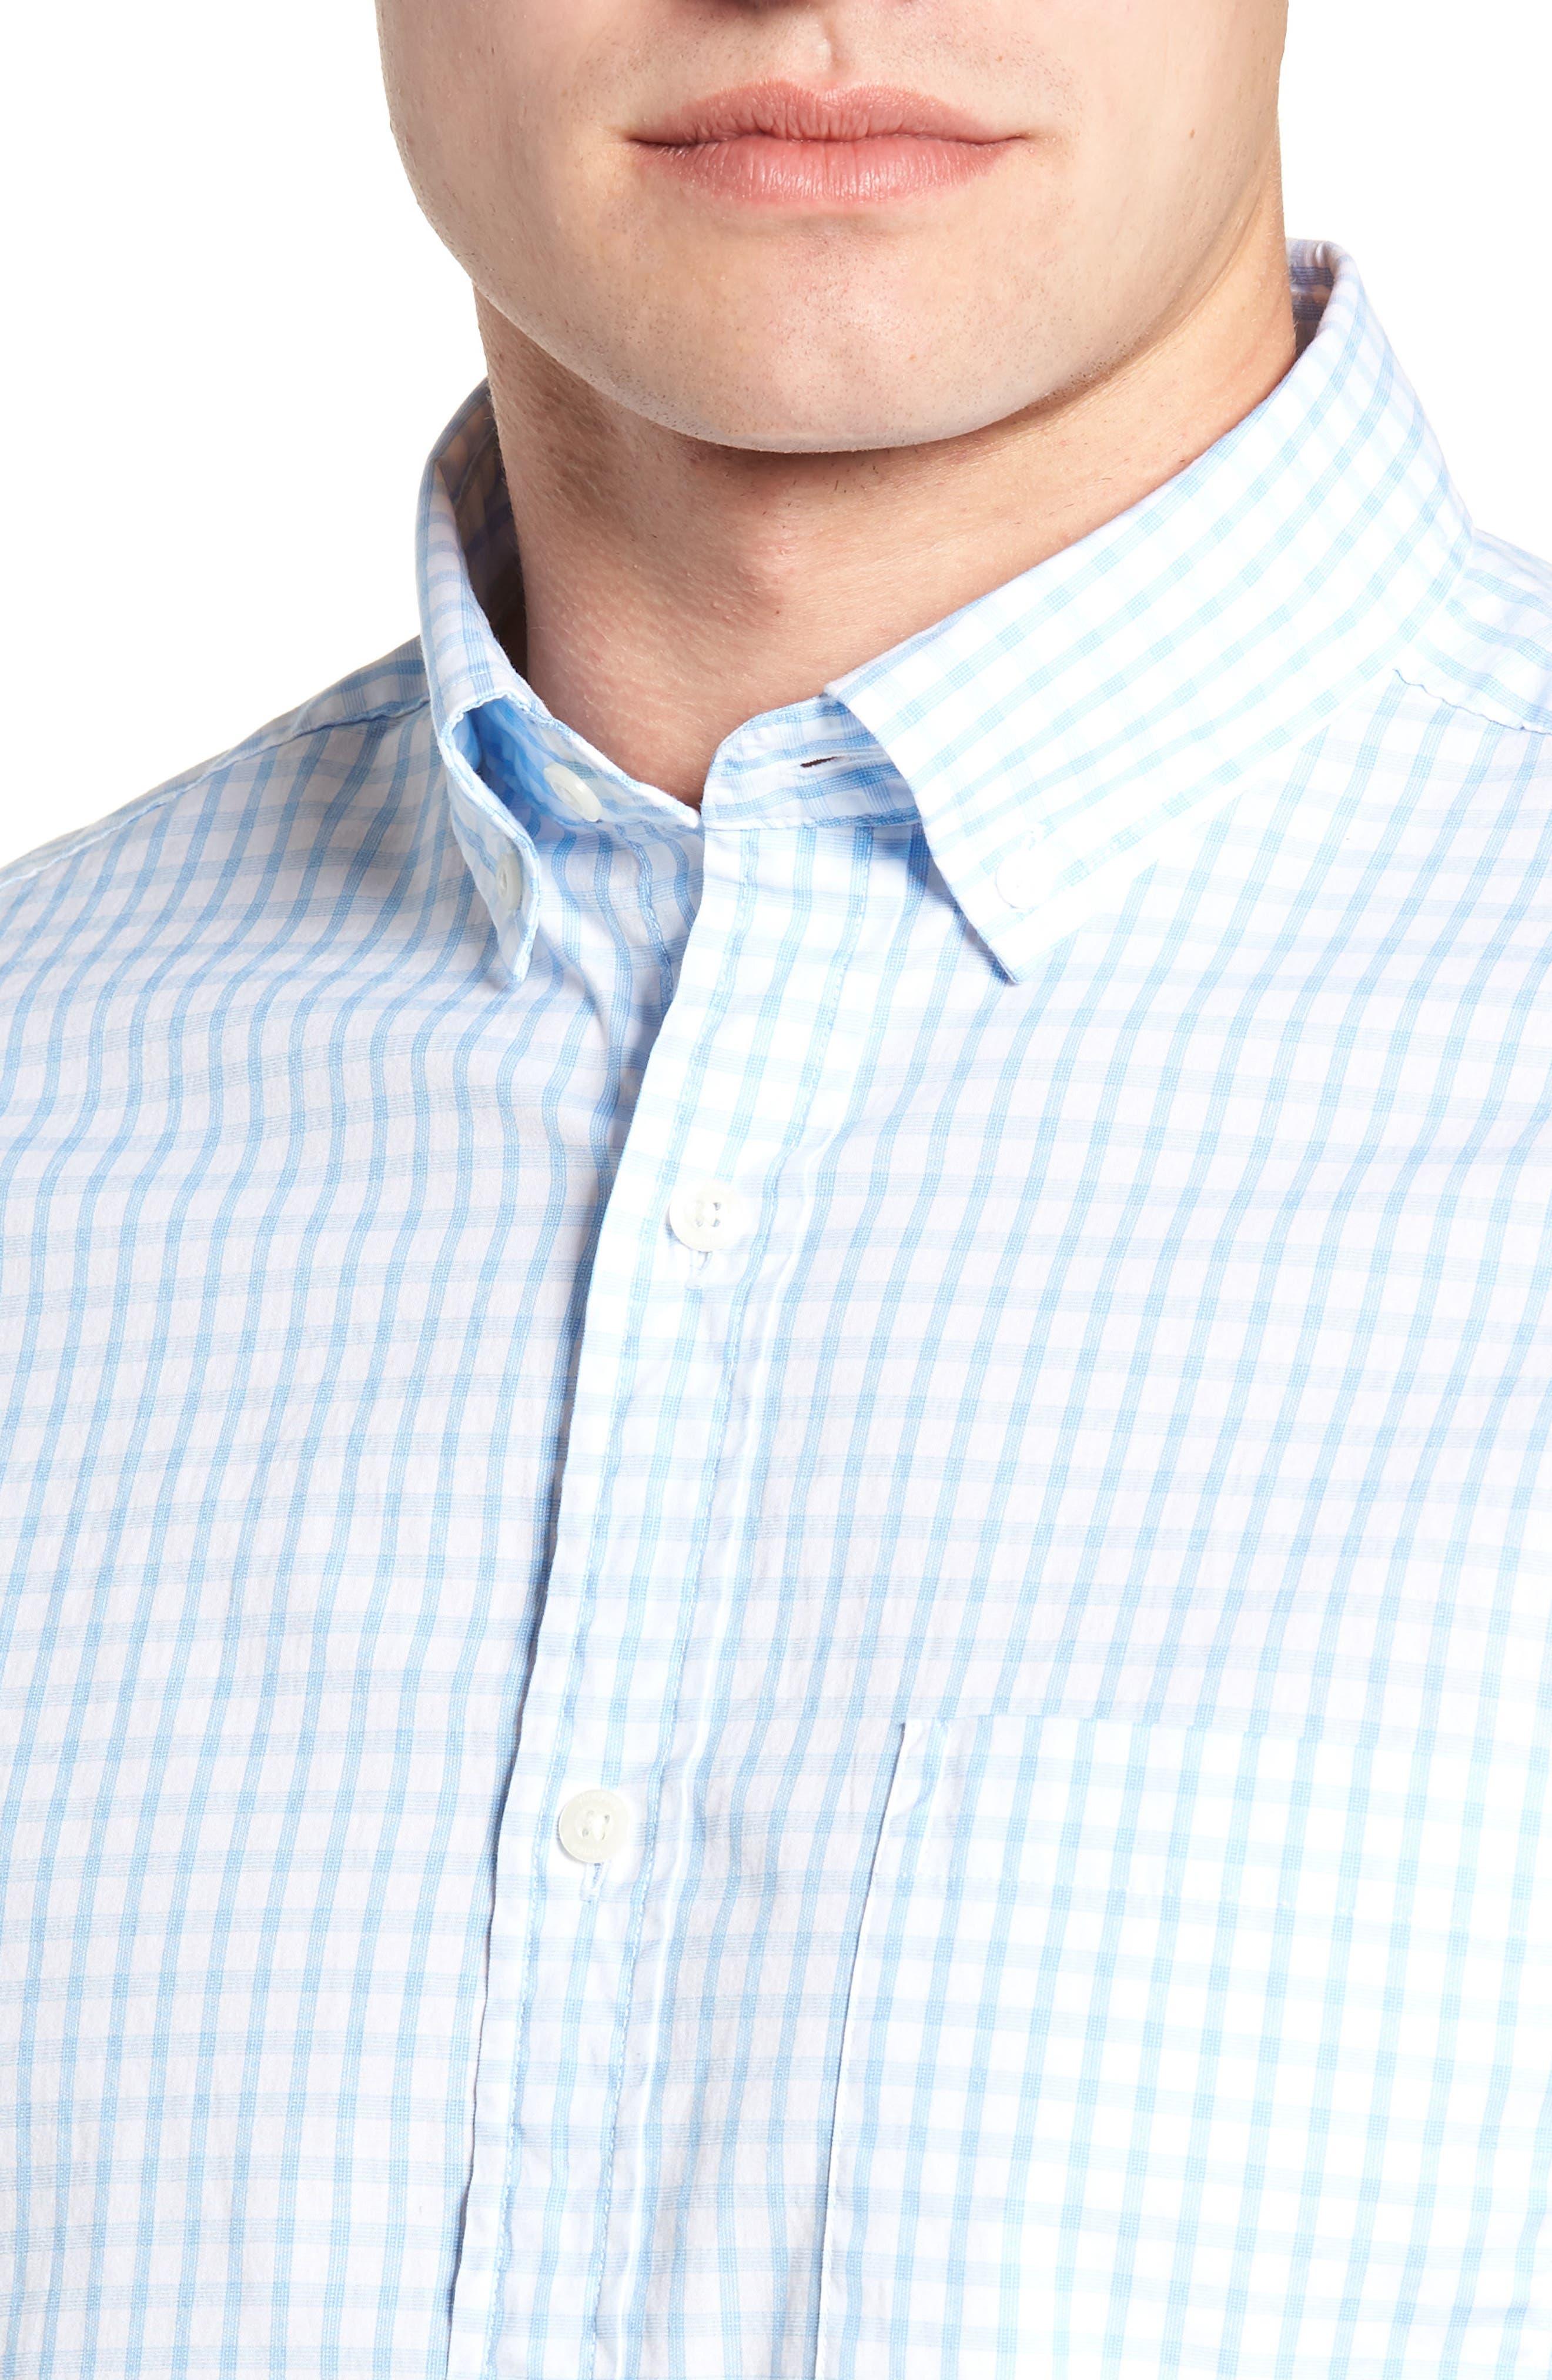 VINEYARD VINES, Micro Graph Classic Fit Check Sport Shirt, Alternate thumbnail 4, color, OCEAN BREEZE